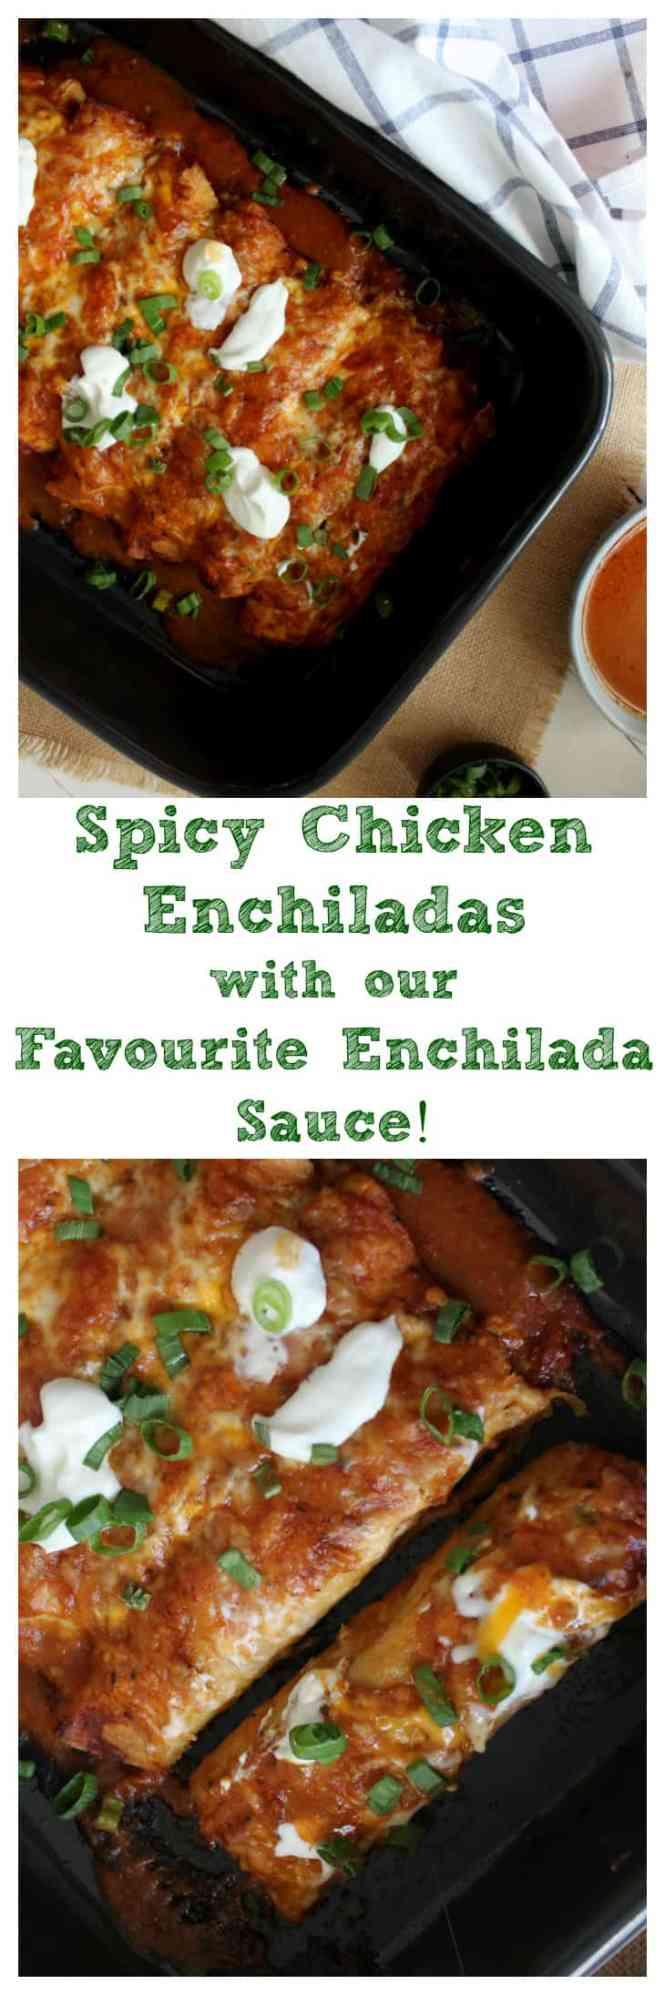 Spicy Chicken Enchiladas with our Favourite Enchilada Sauce